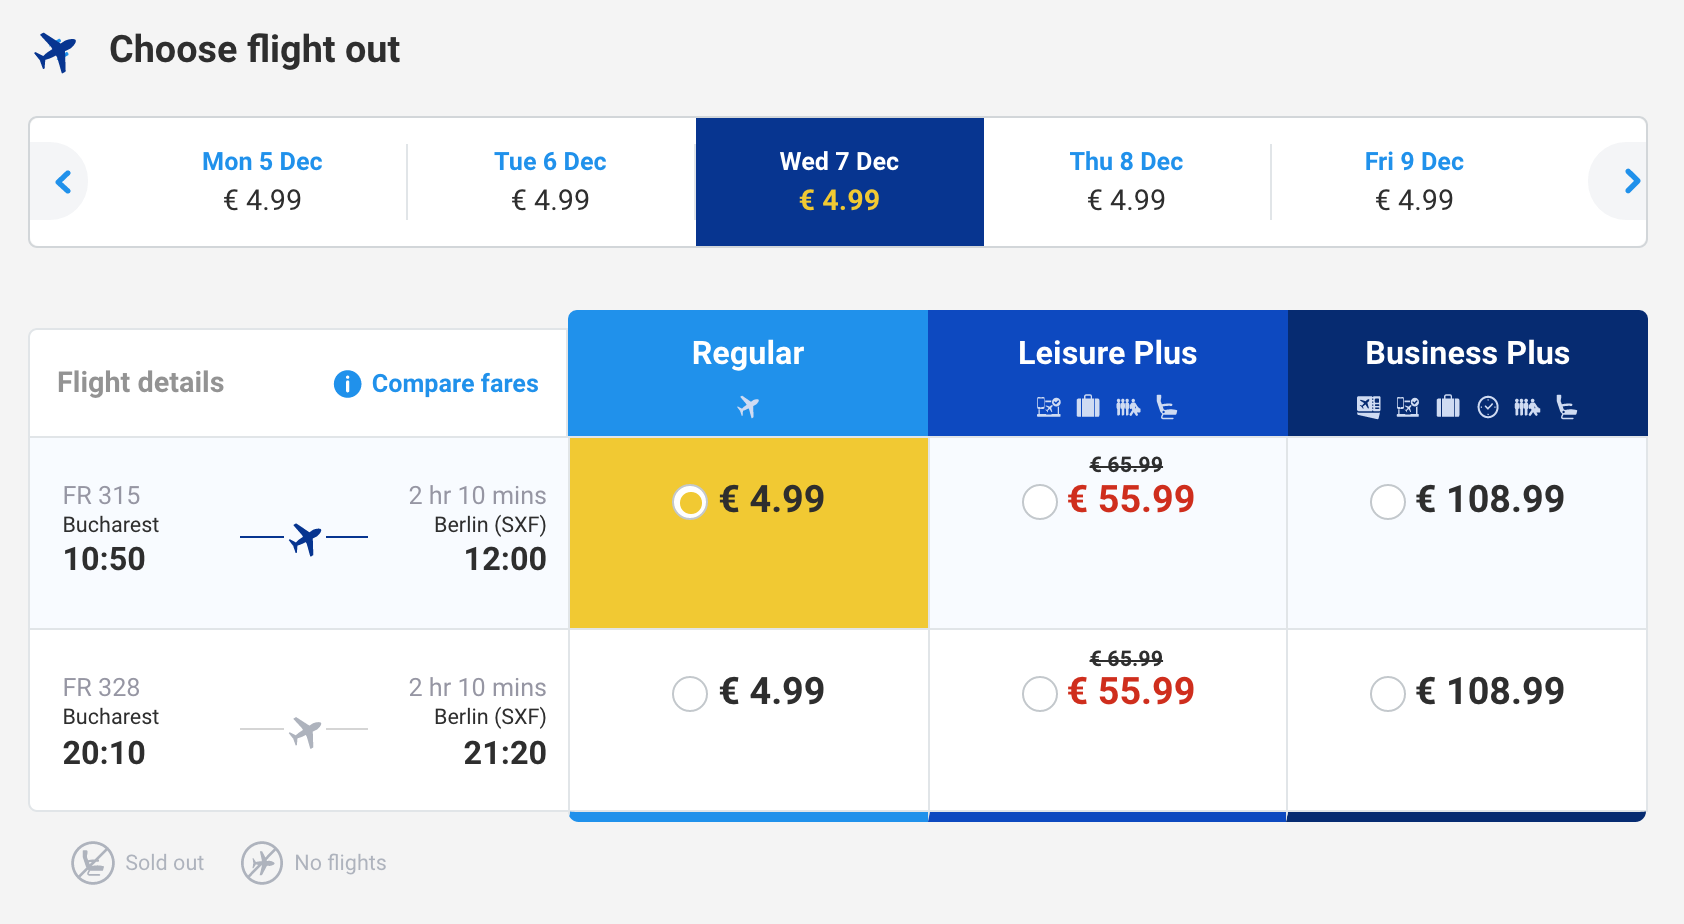 bilet-avion-ieftin-decembrie